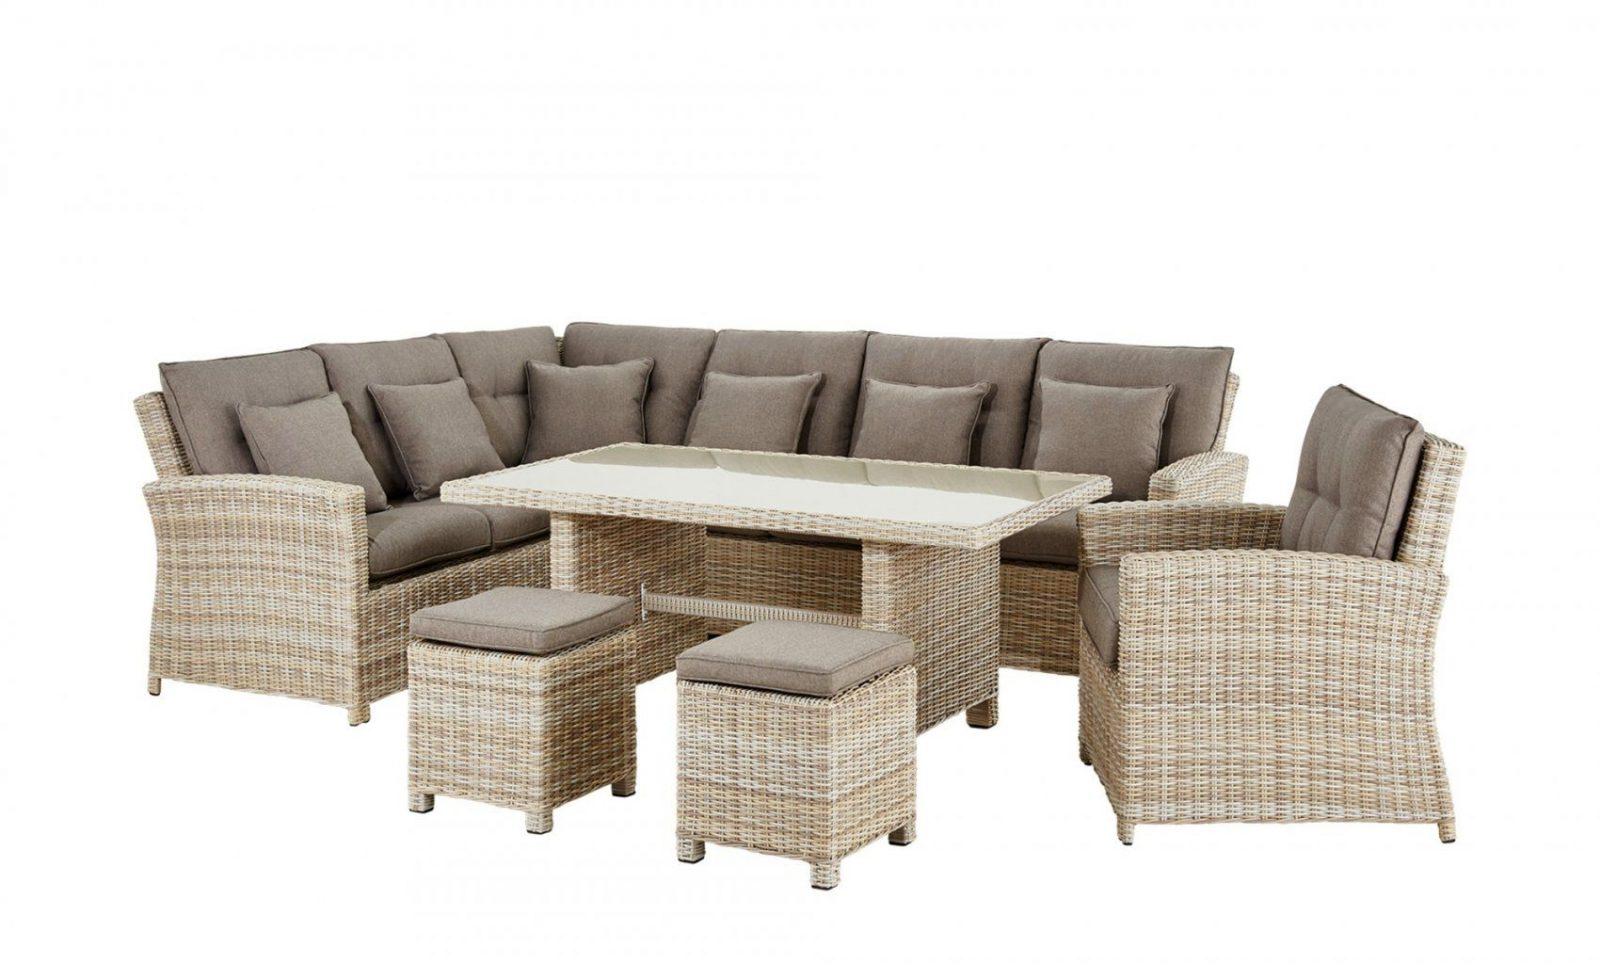 a casa mia gartenm bel haus design ideen. Black Bedroom Furniture Sets. Home Design Ideas